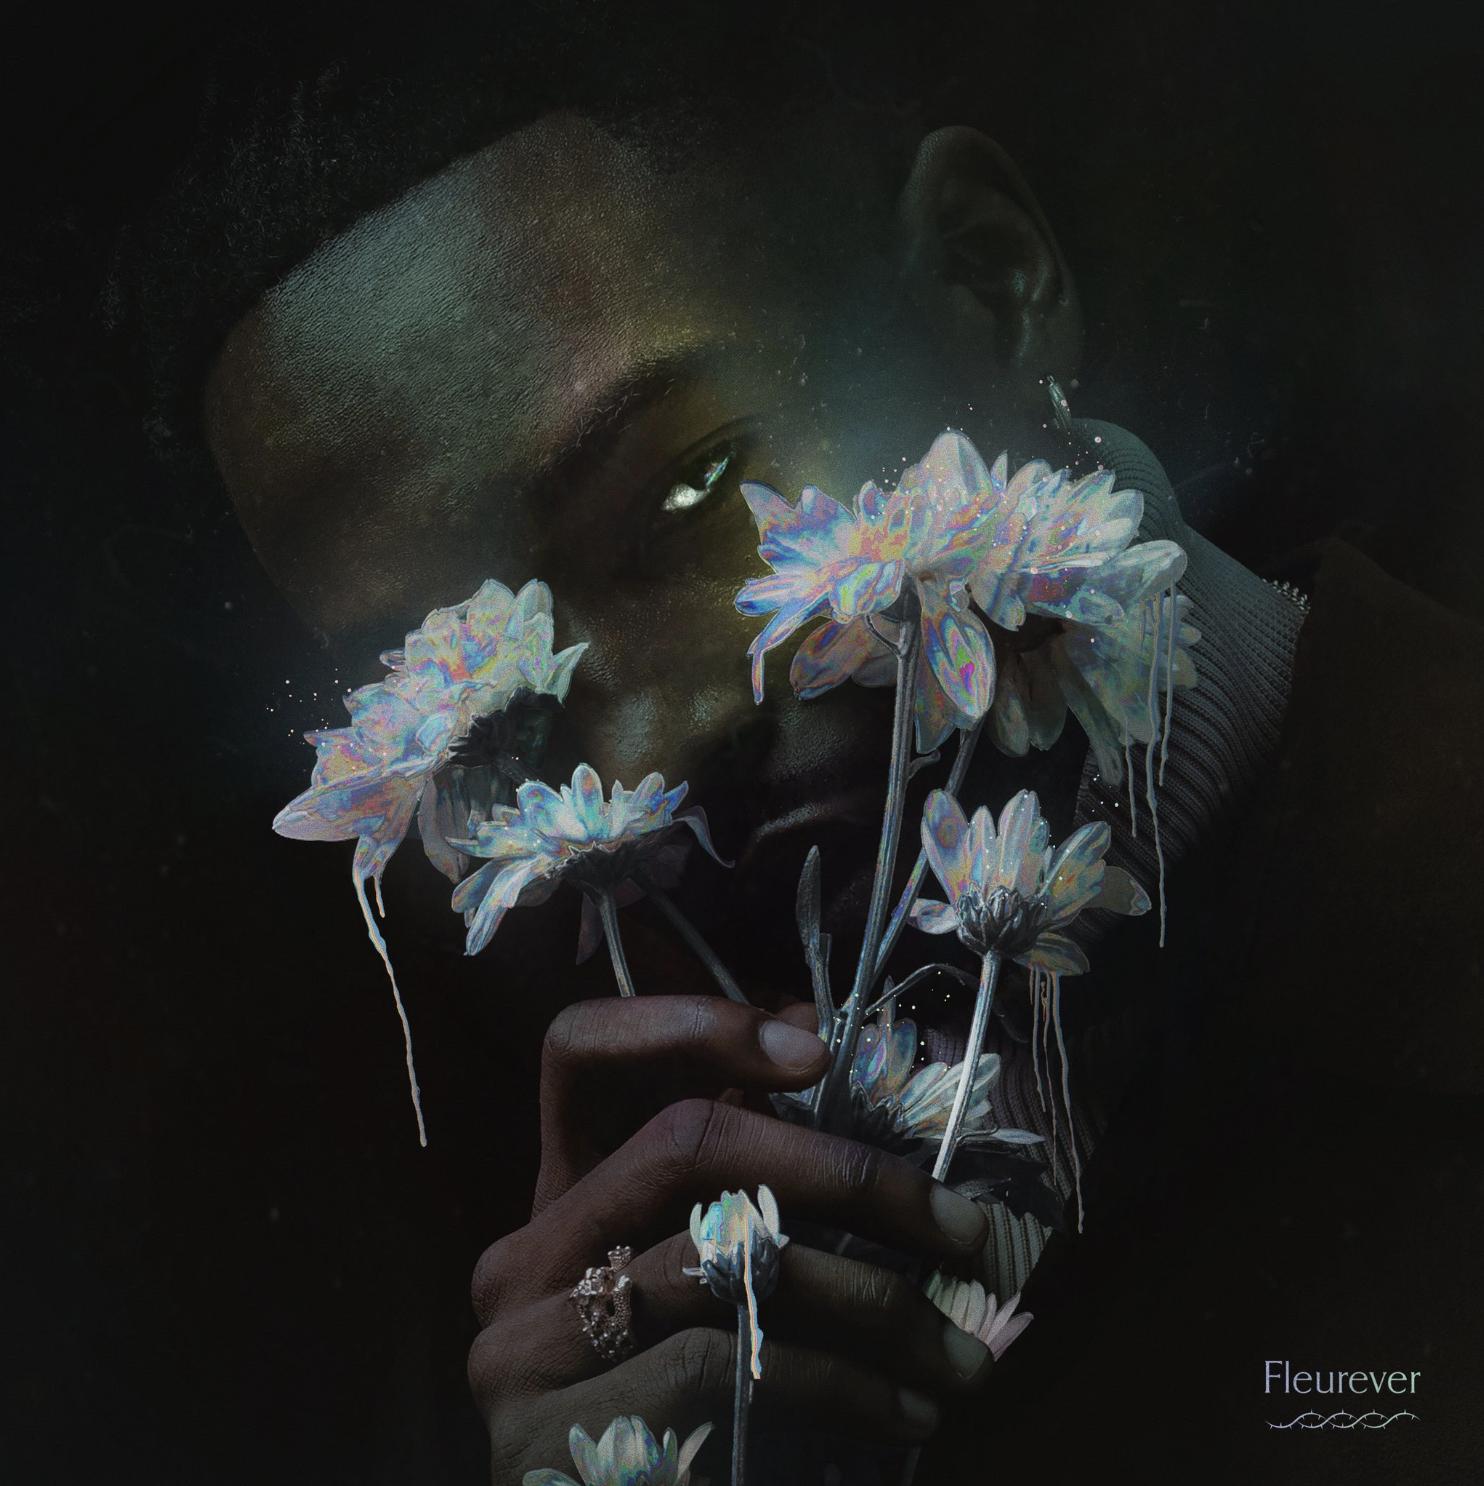 Jazz Cartier Drops New Album 'Fleurever'